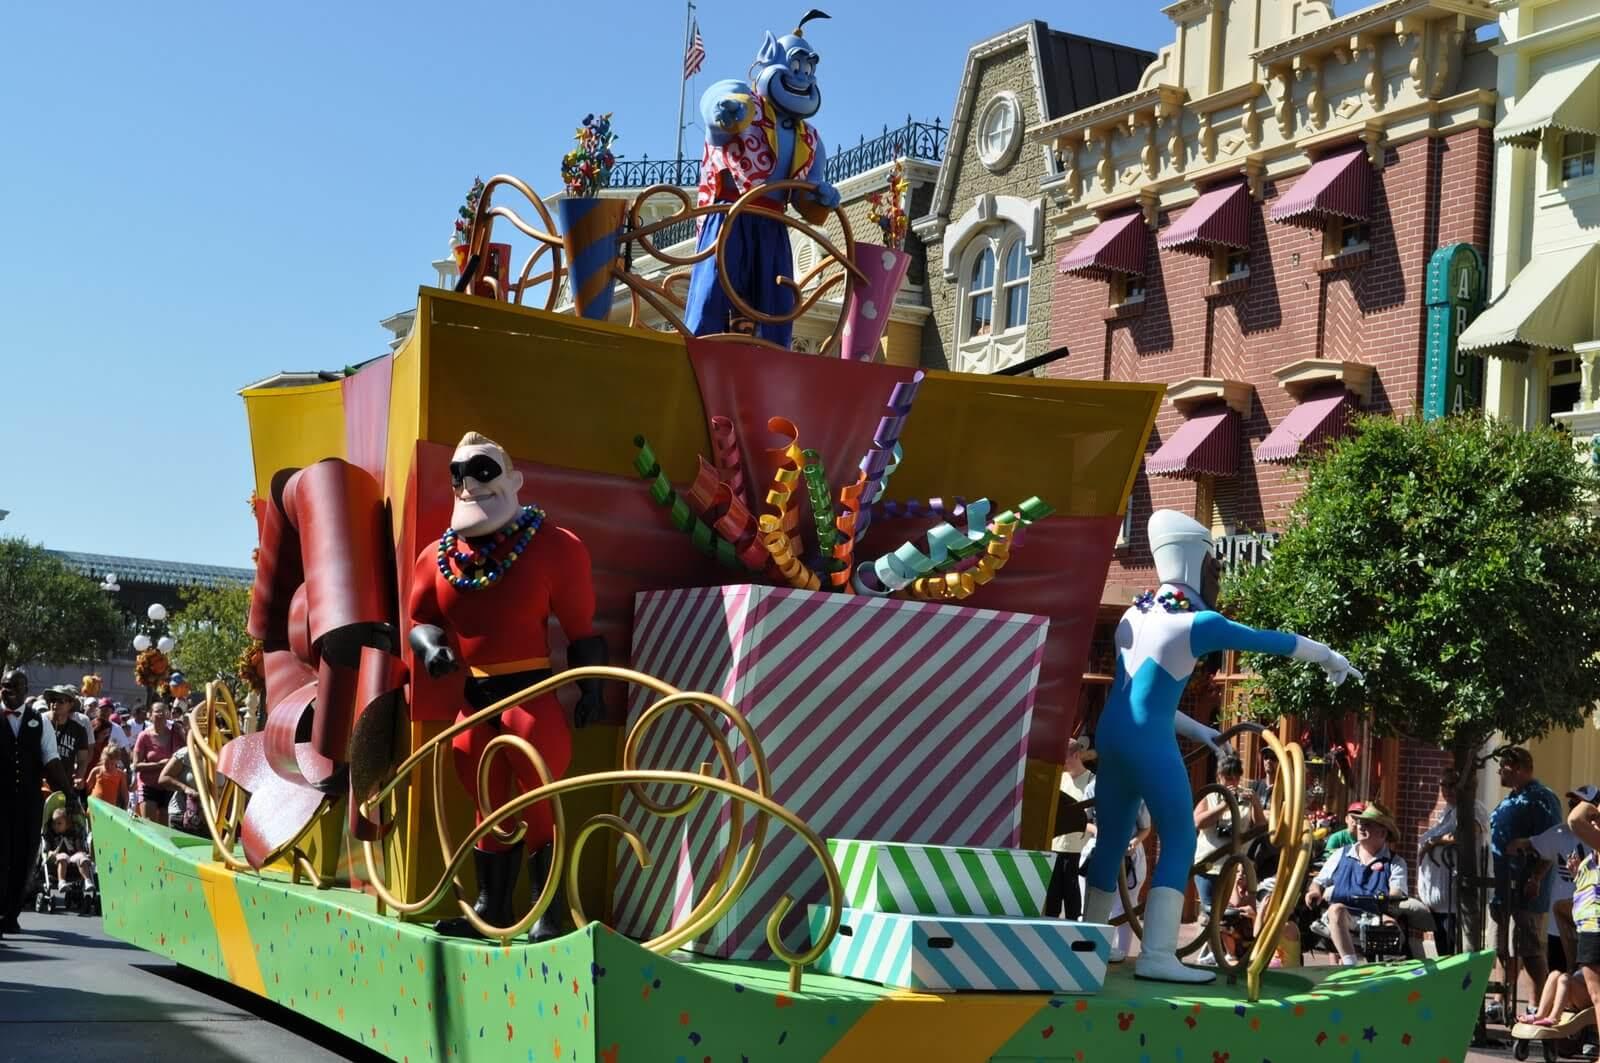 Walt Disney World Parade Guide: Move It! Shake It! Celebrate It! Street Party at Magic Kingdom